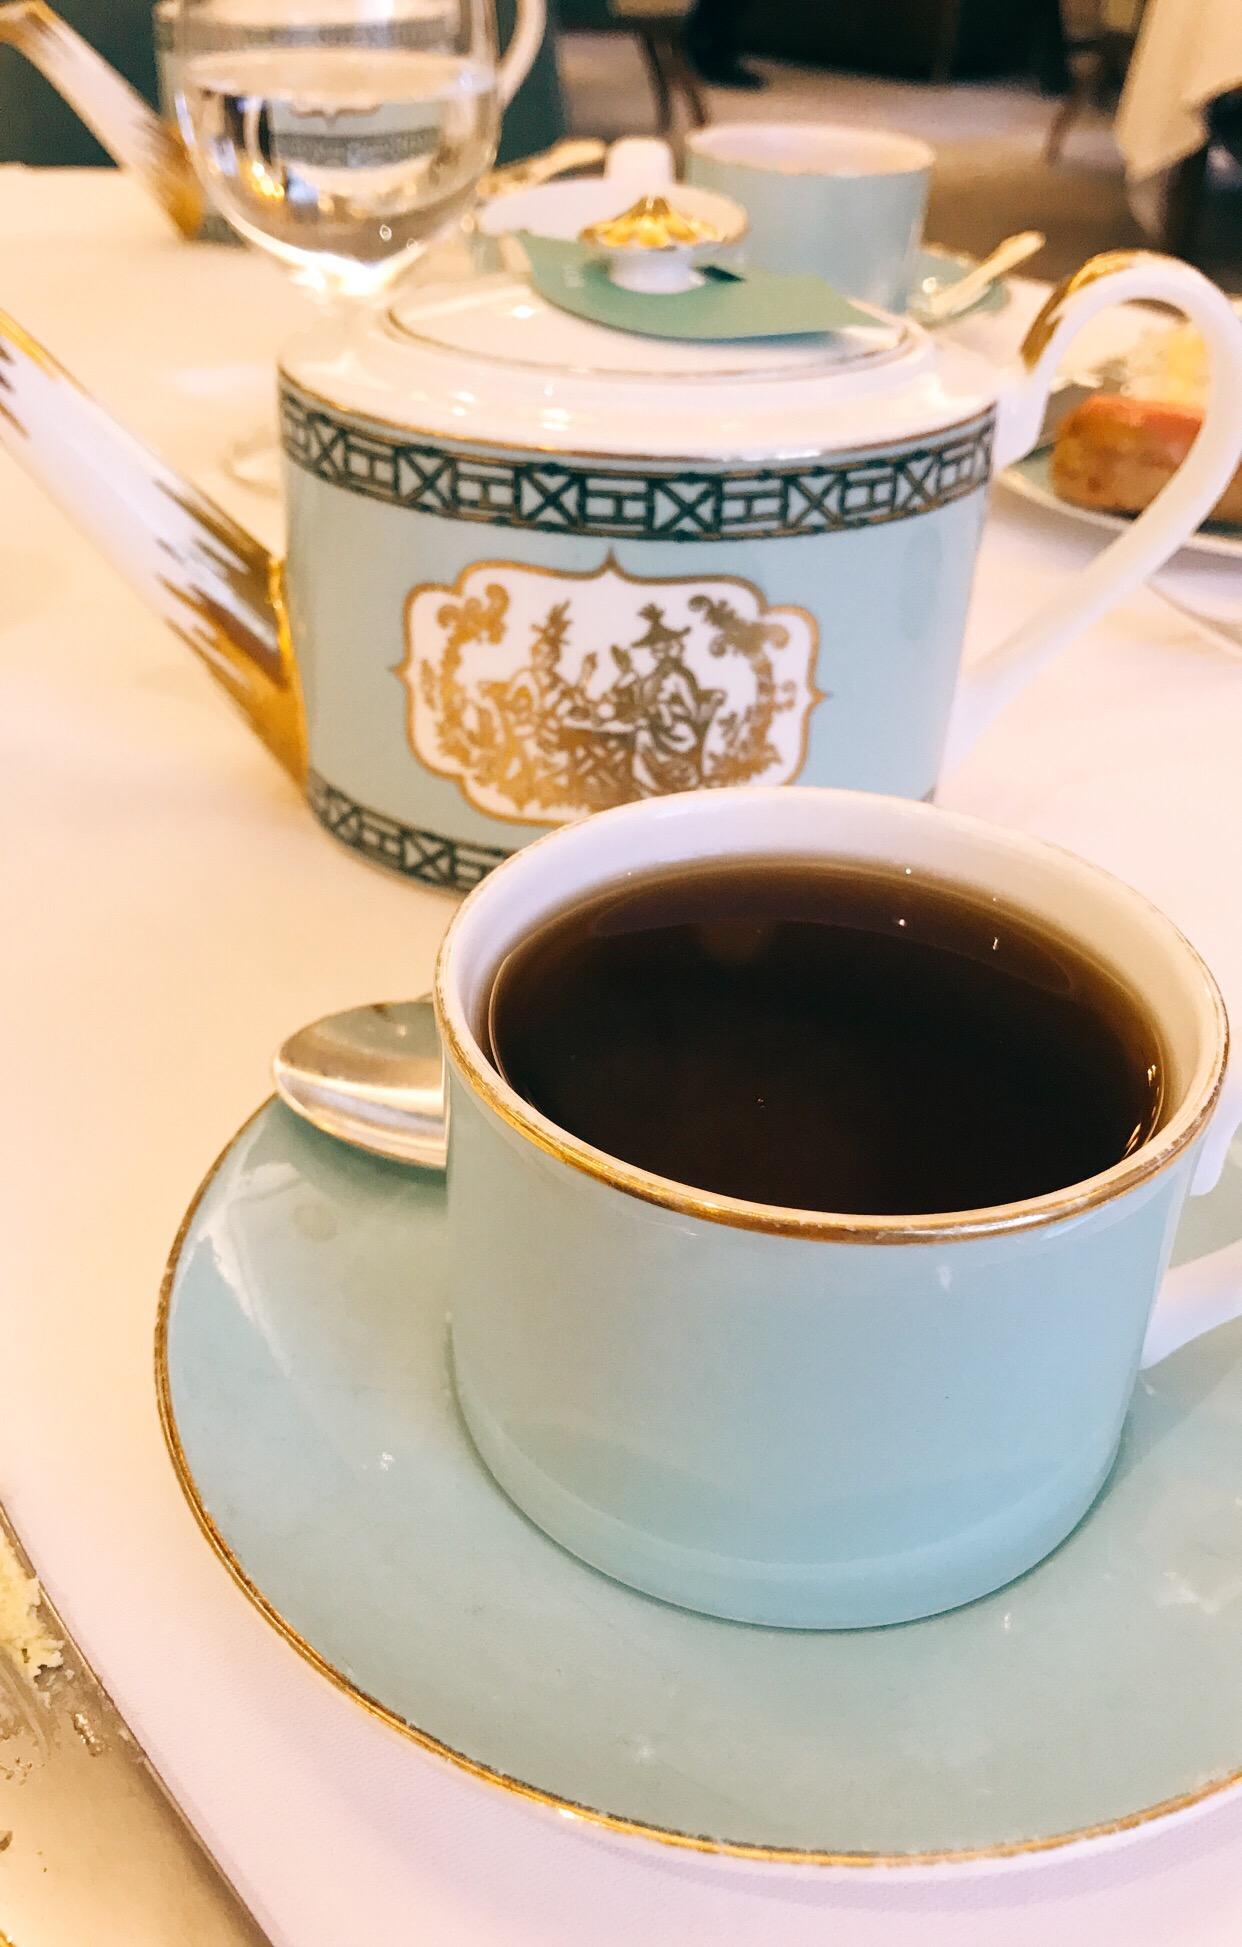 Afternoon tea at Fortnum & Mason